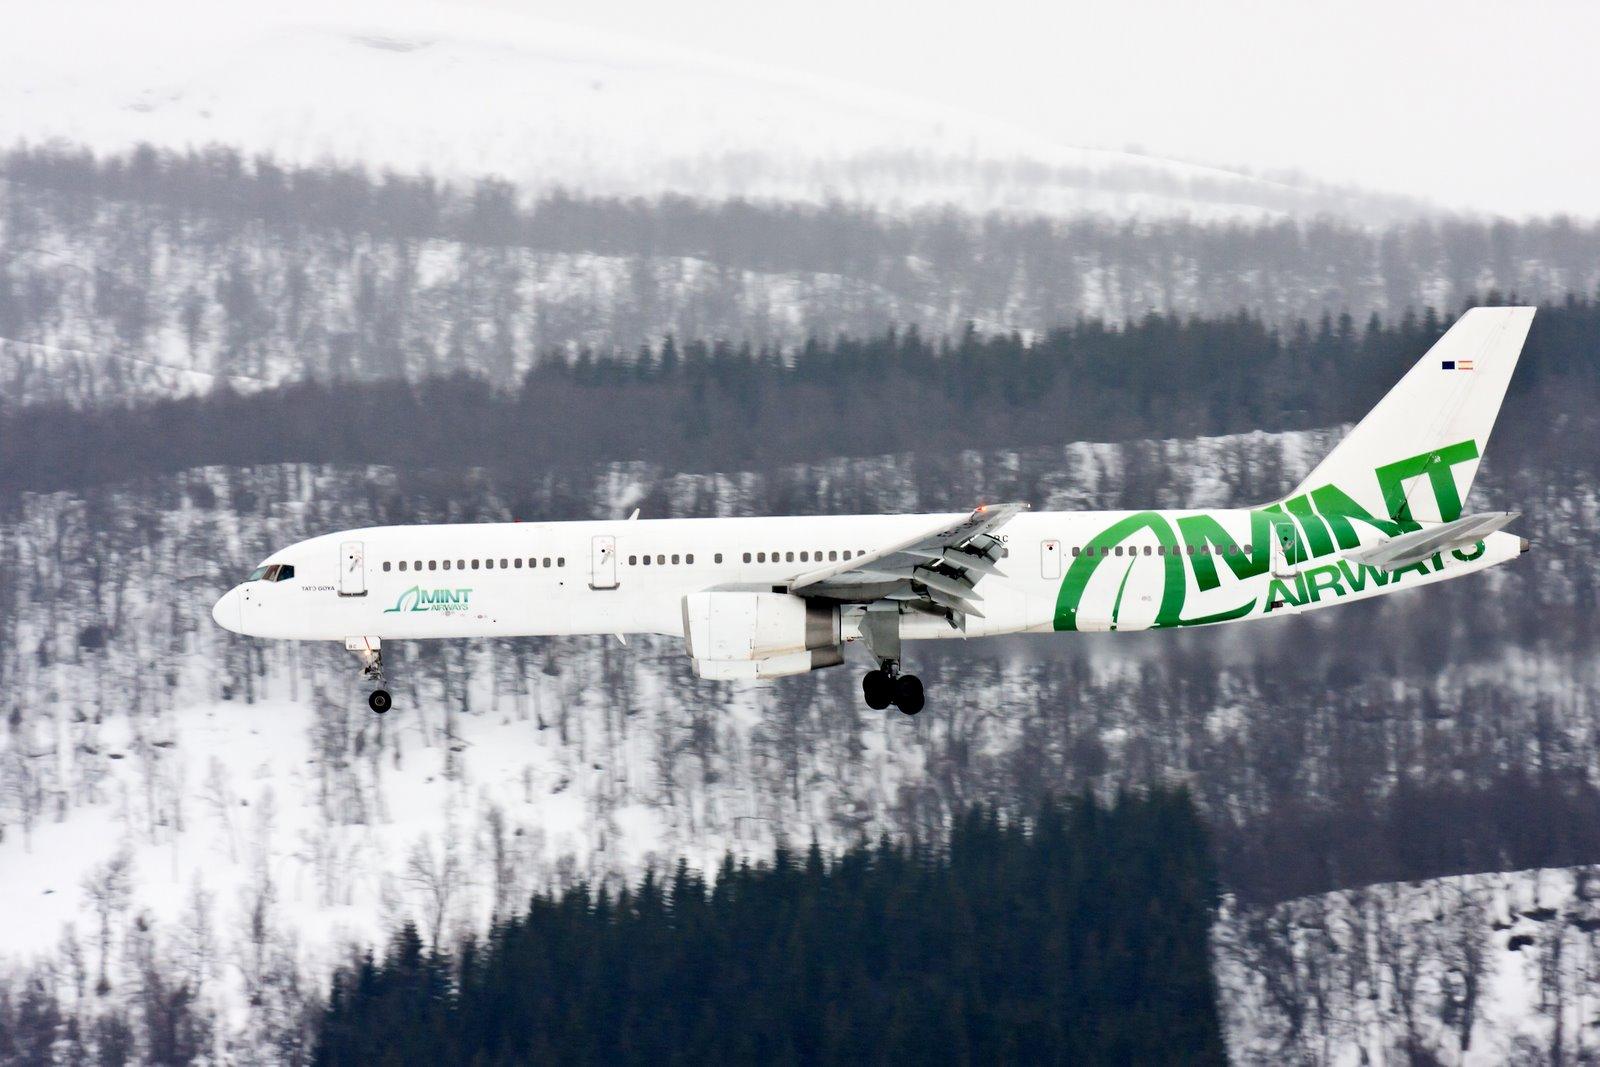 Авиакомпания Минт Эйрвэйз (Mint Airways).2